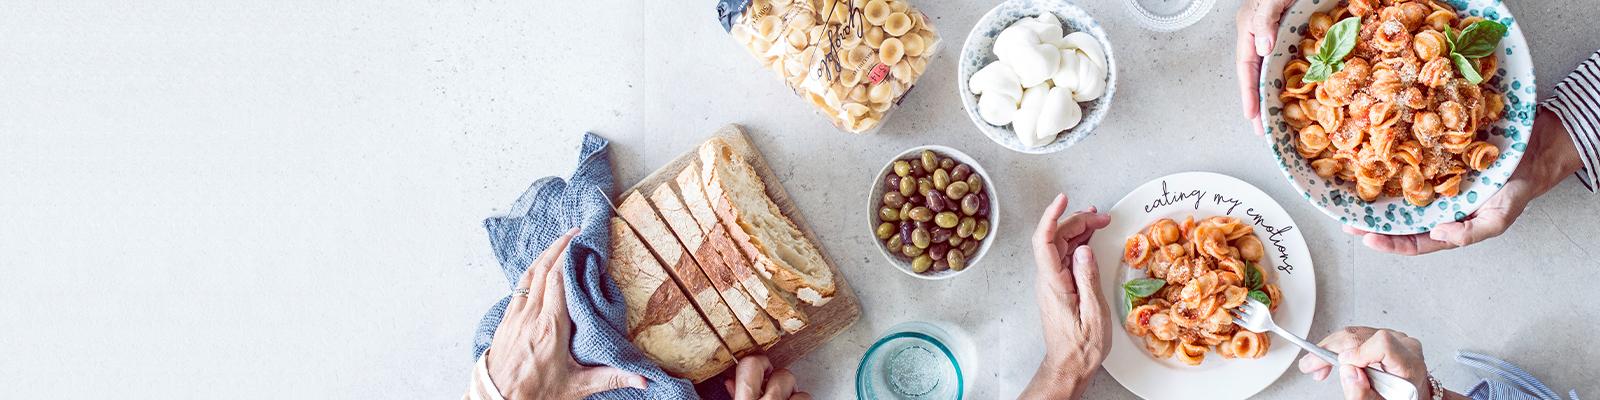 Pasta Garofalo - Des pâtes uniques